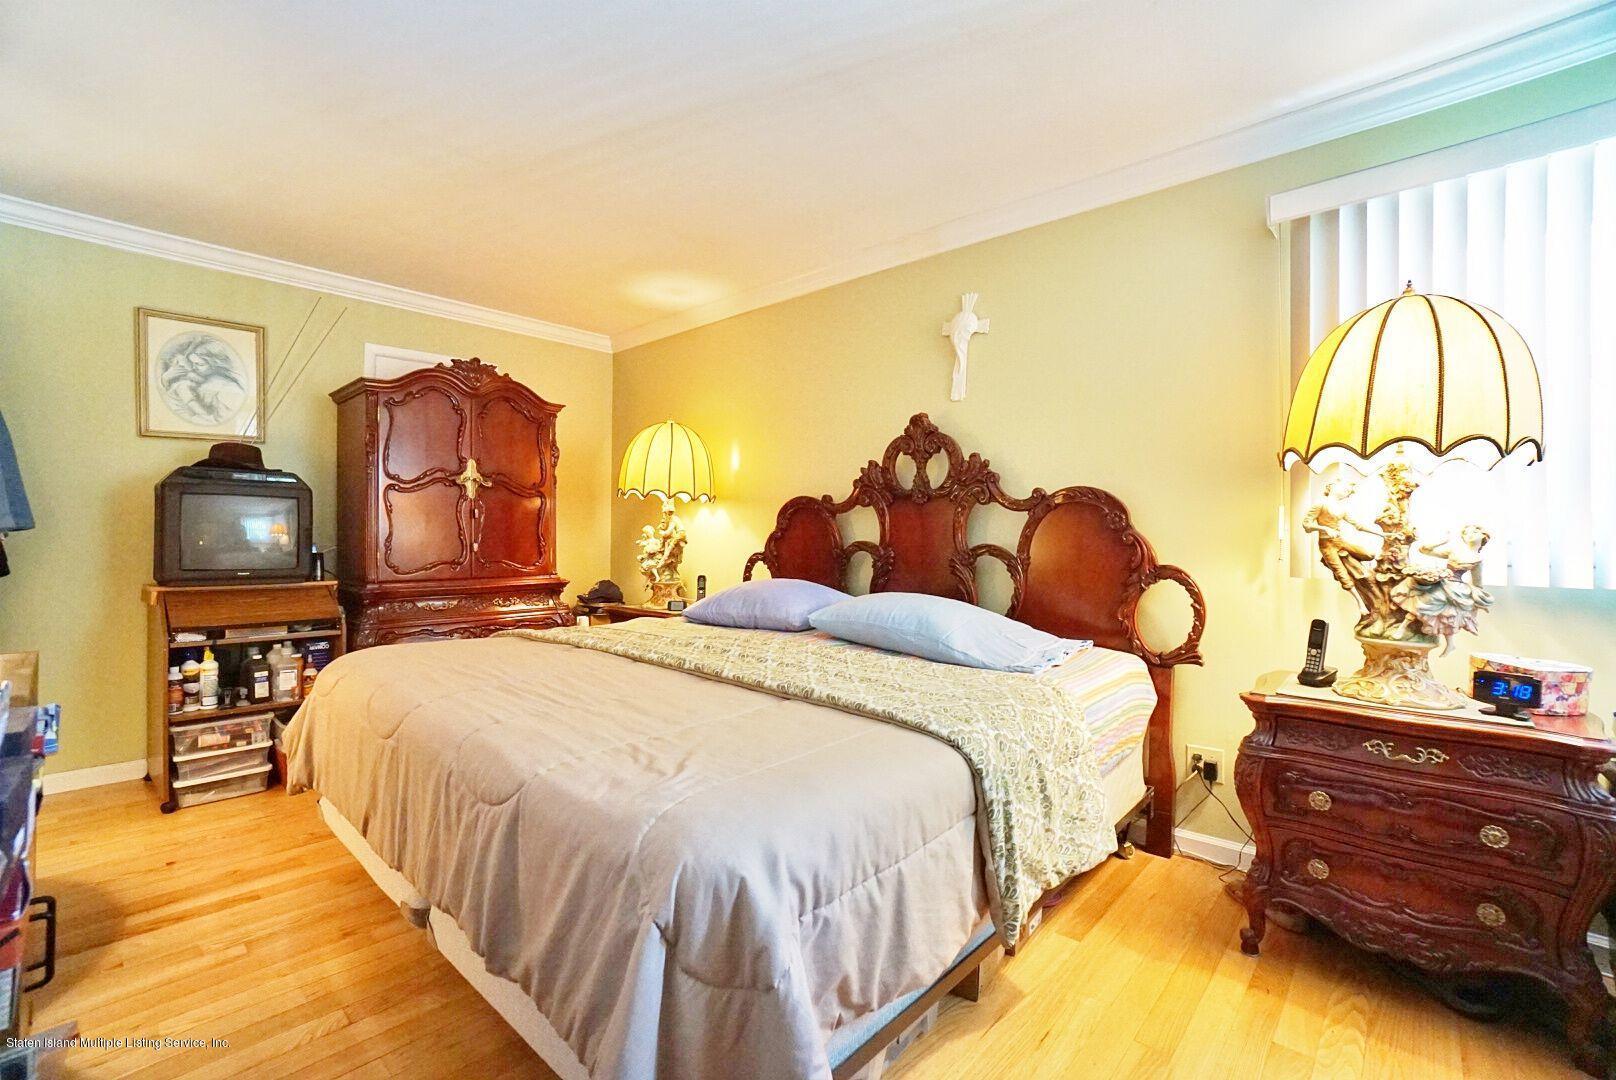 Single Family - Detached 283 Holdridge Avenue  Staten Island, NY 10312, MLS-1130000-14